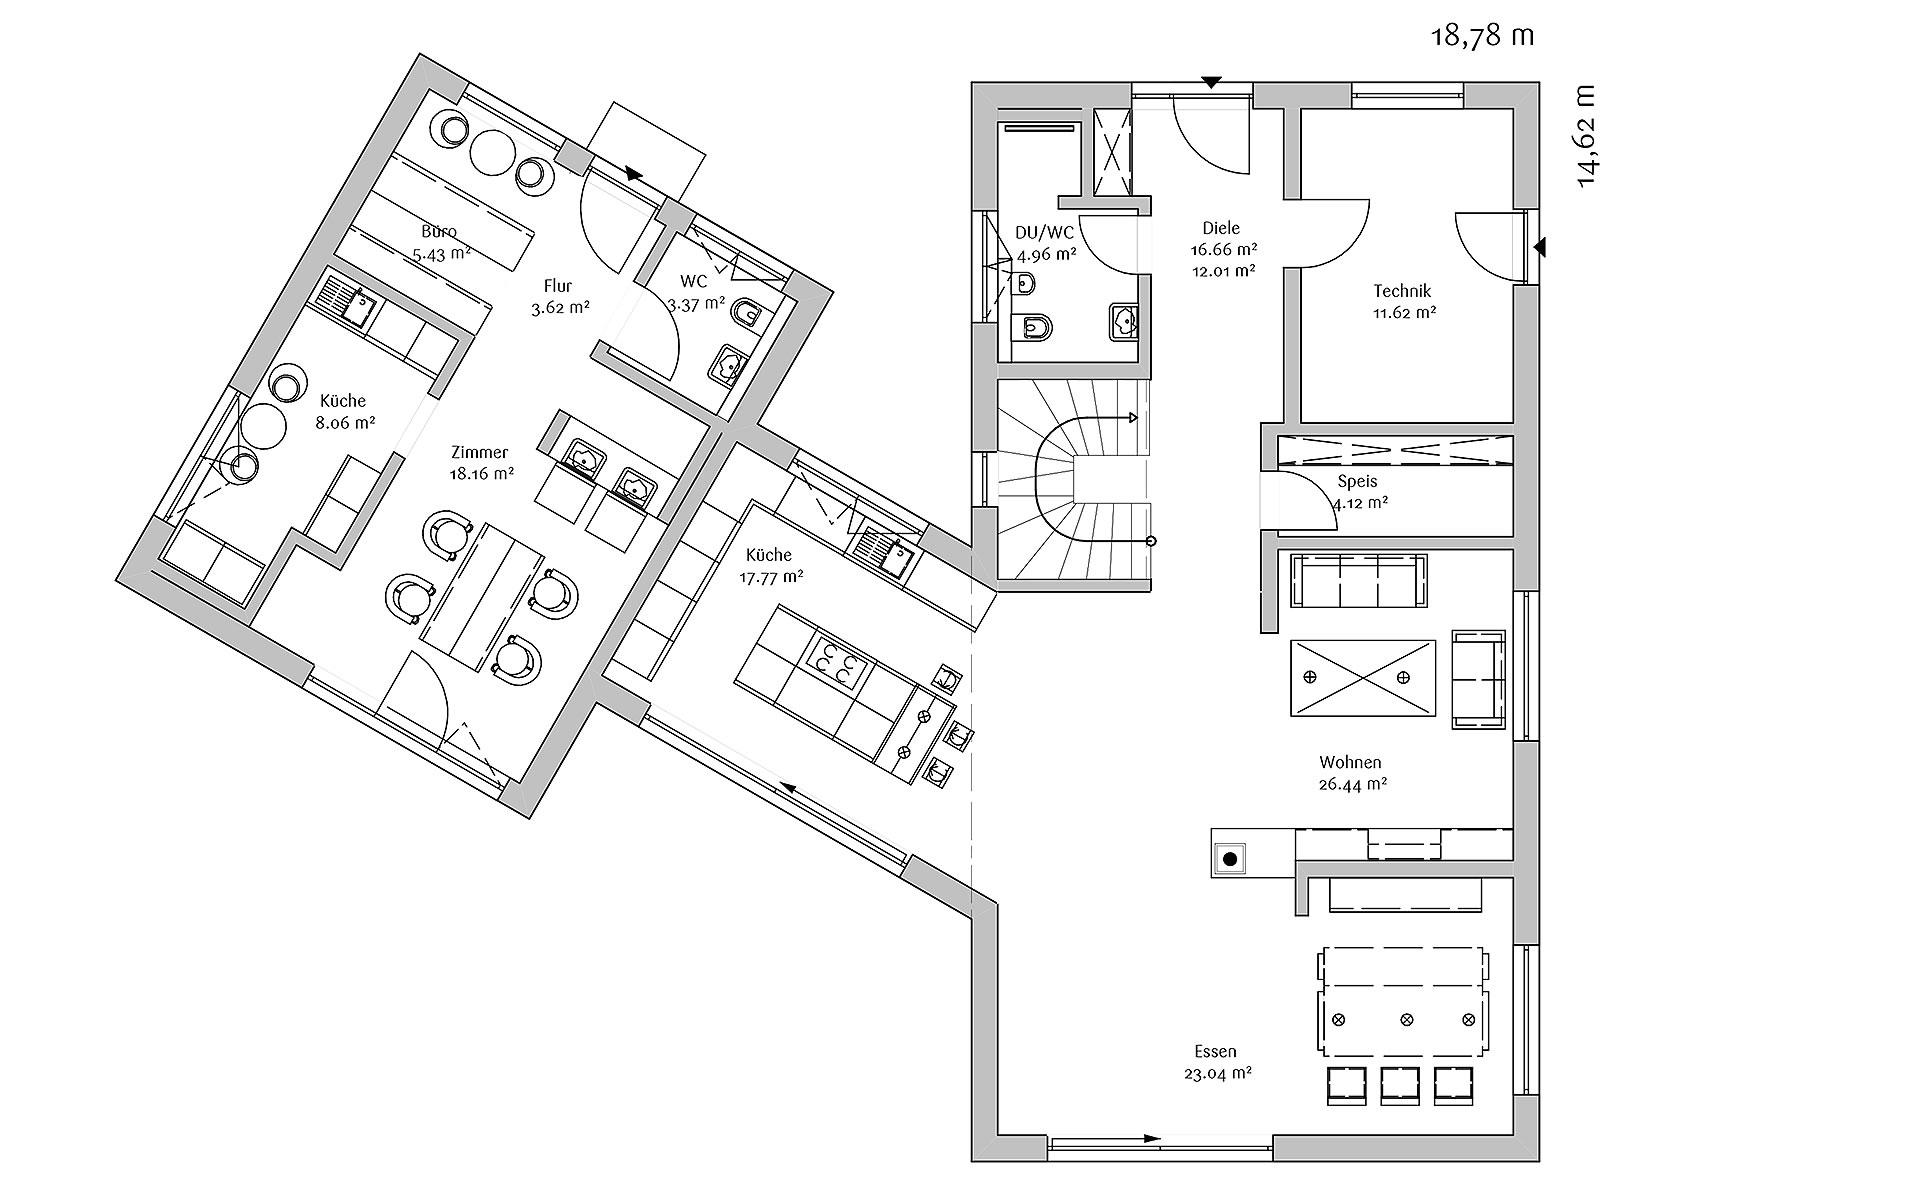 Erdgeschoss Moden 240 von FischerHaus GmbH & Co. KG